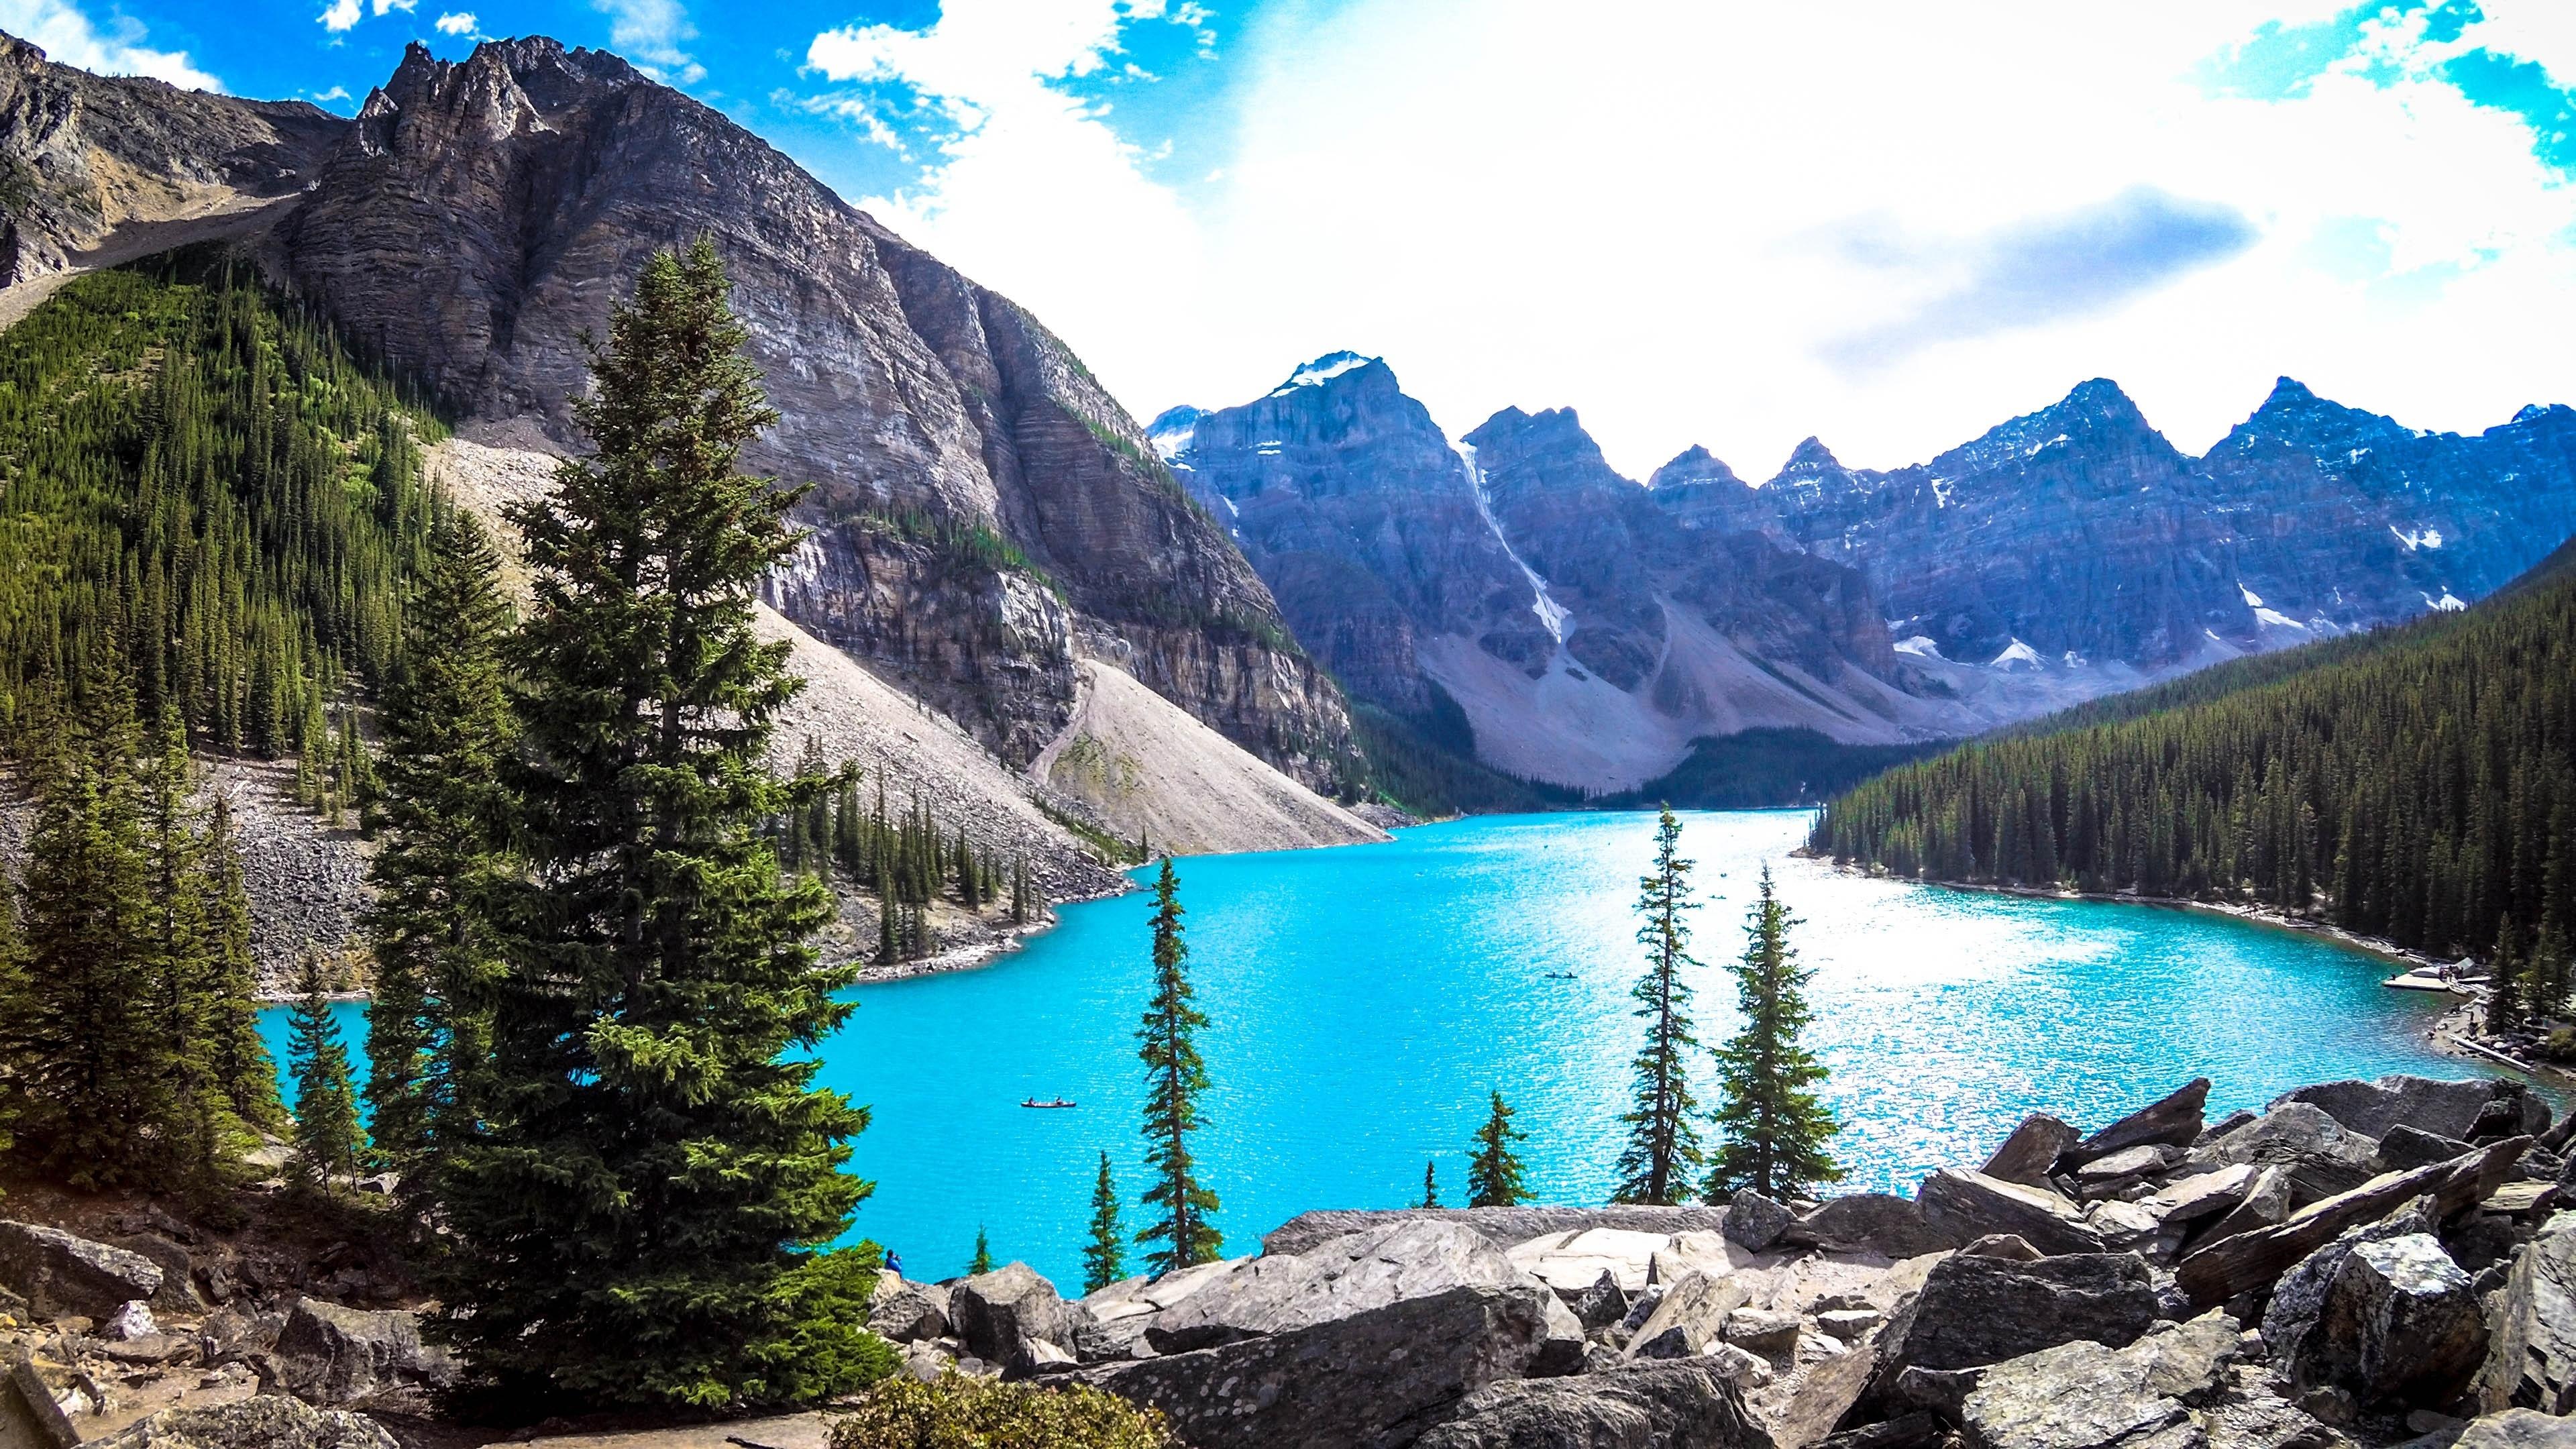 Download 3840x2160 Wallpaper Moraine Lake Banff National